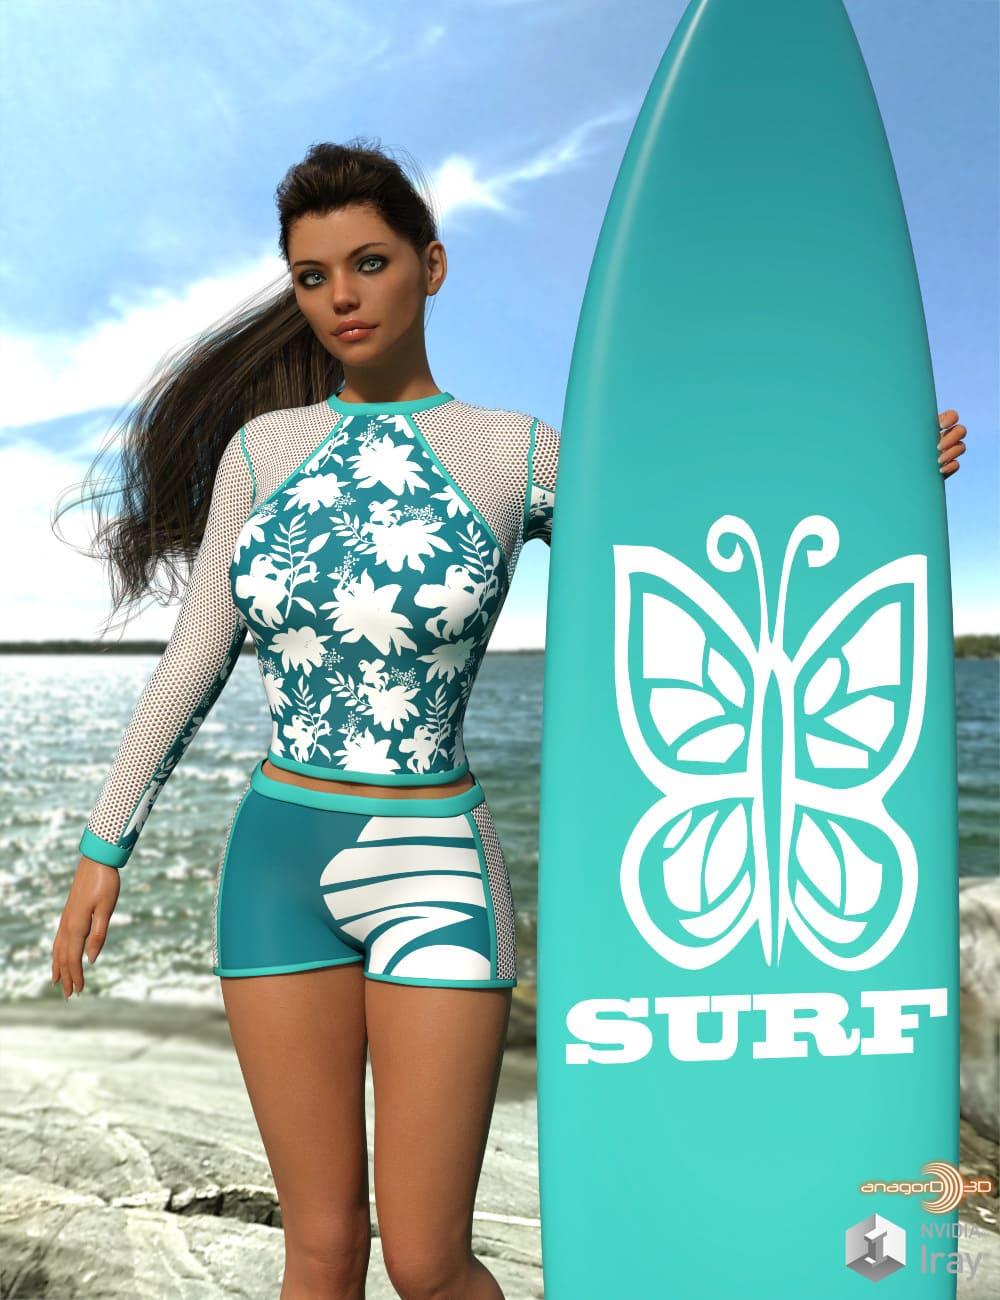 VERSUS - Surfer Girl Outfit for Genesis 8 Female_DAZ3D下载站